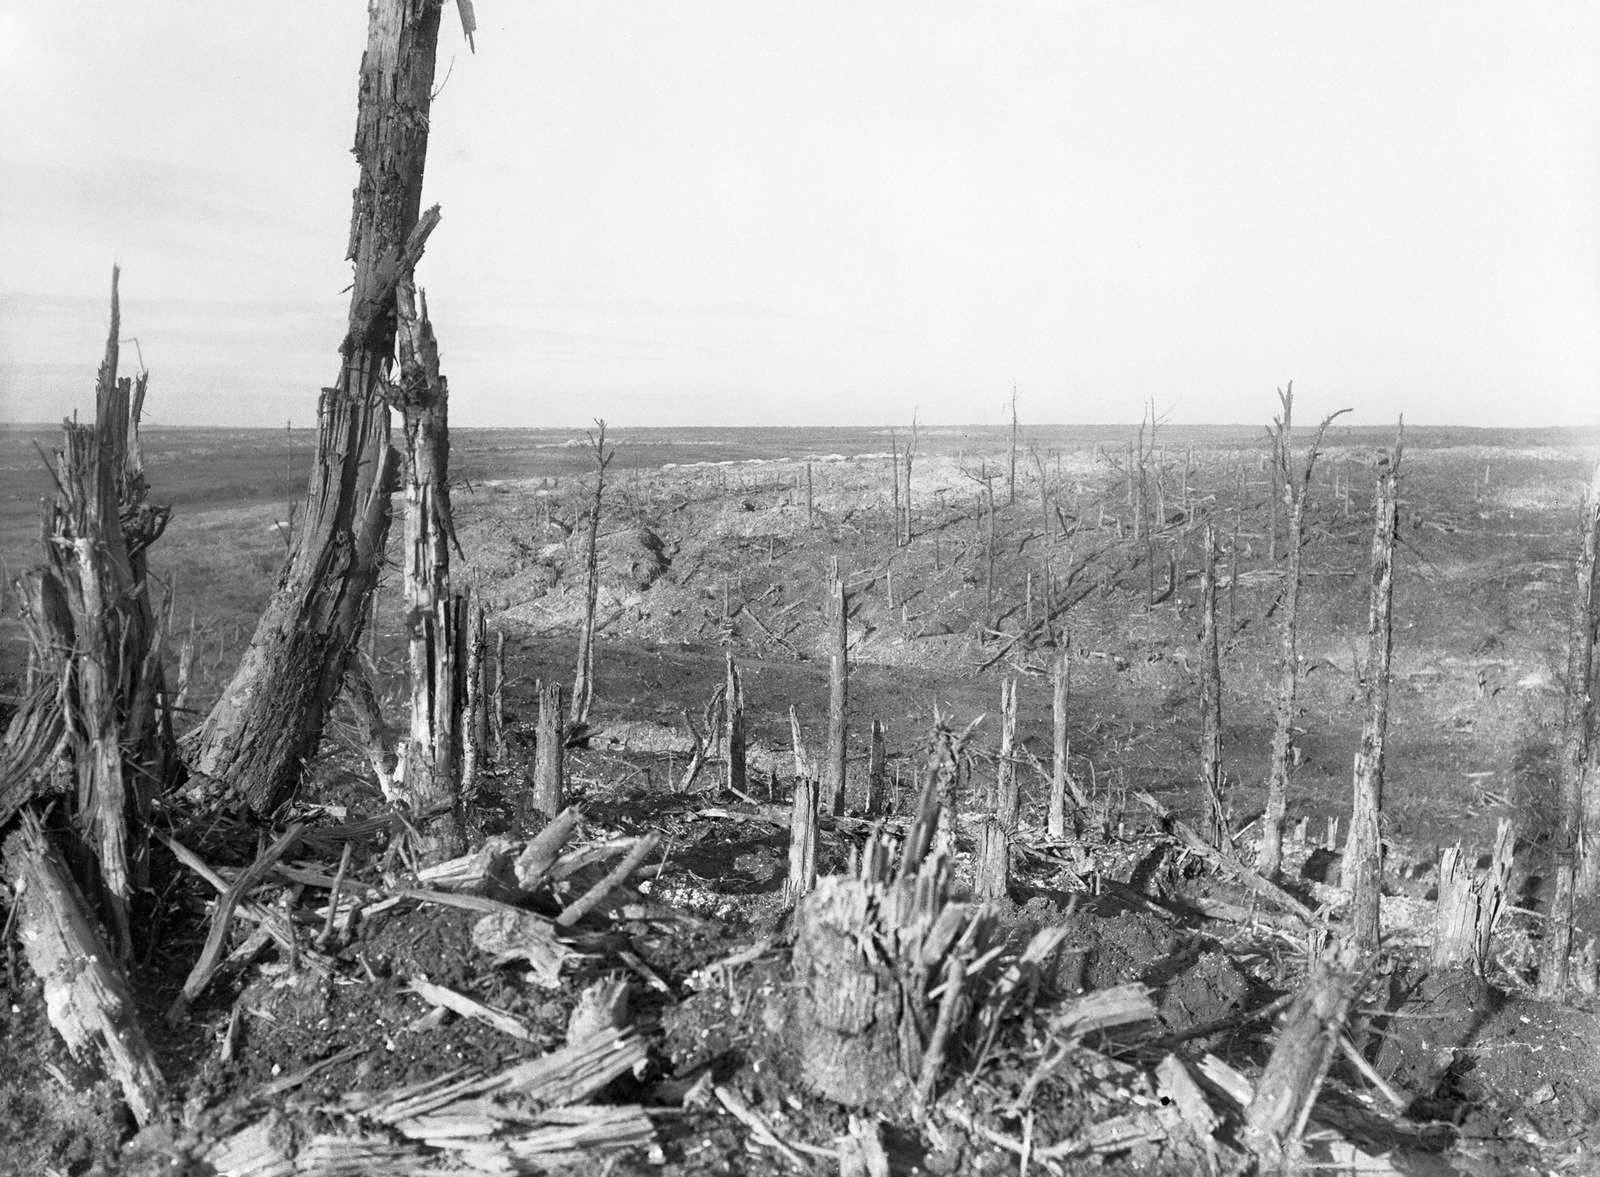 The battlefield at Beaumont Hamel.